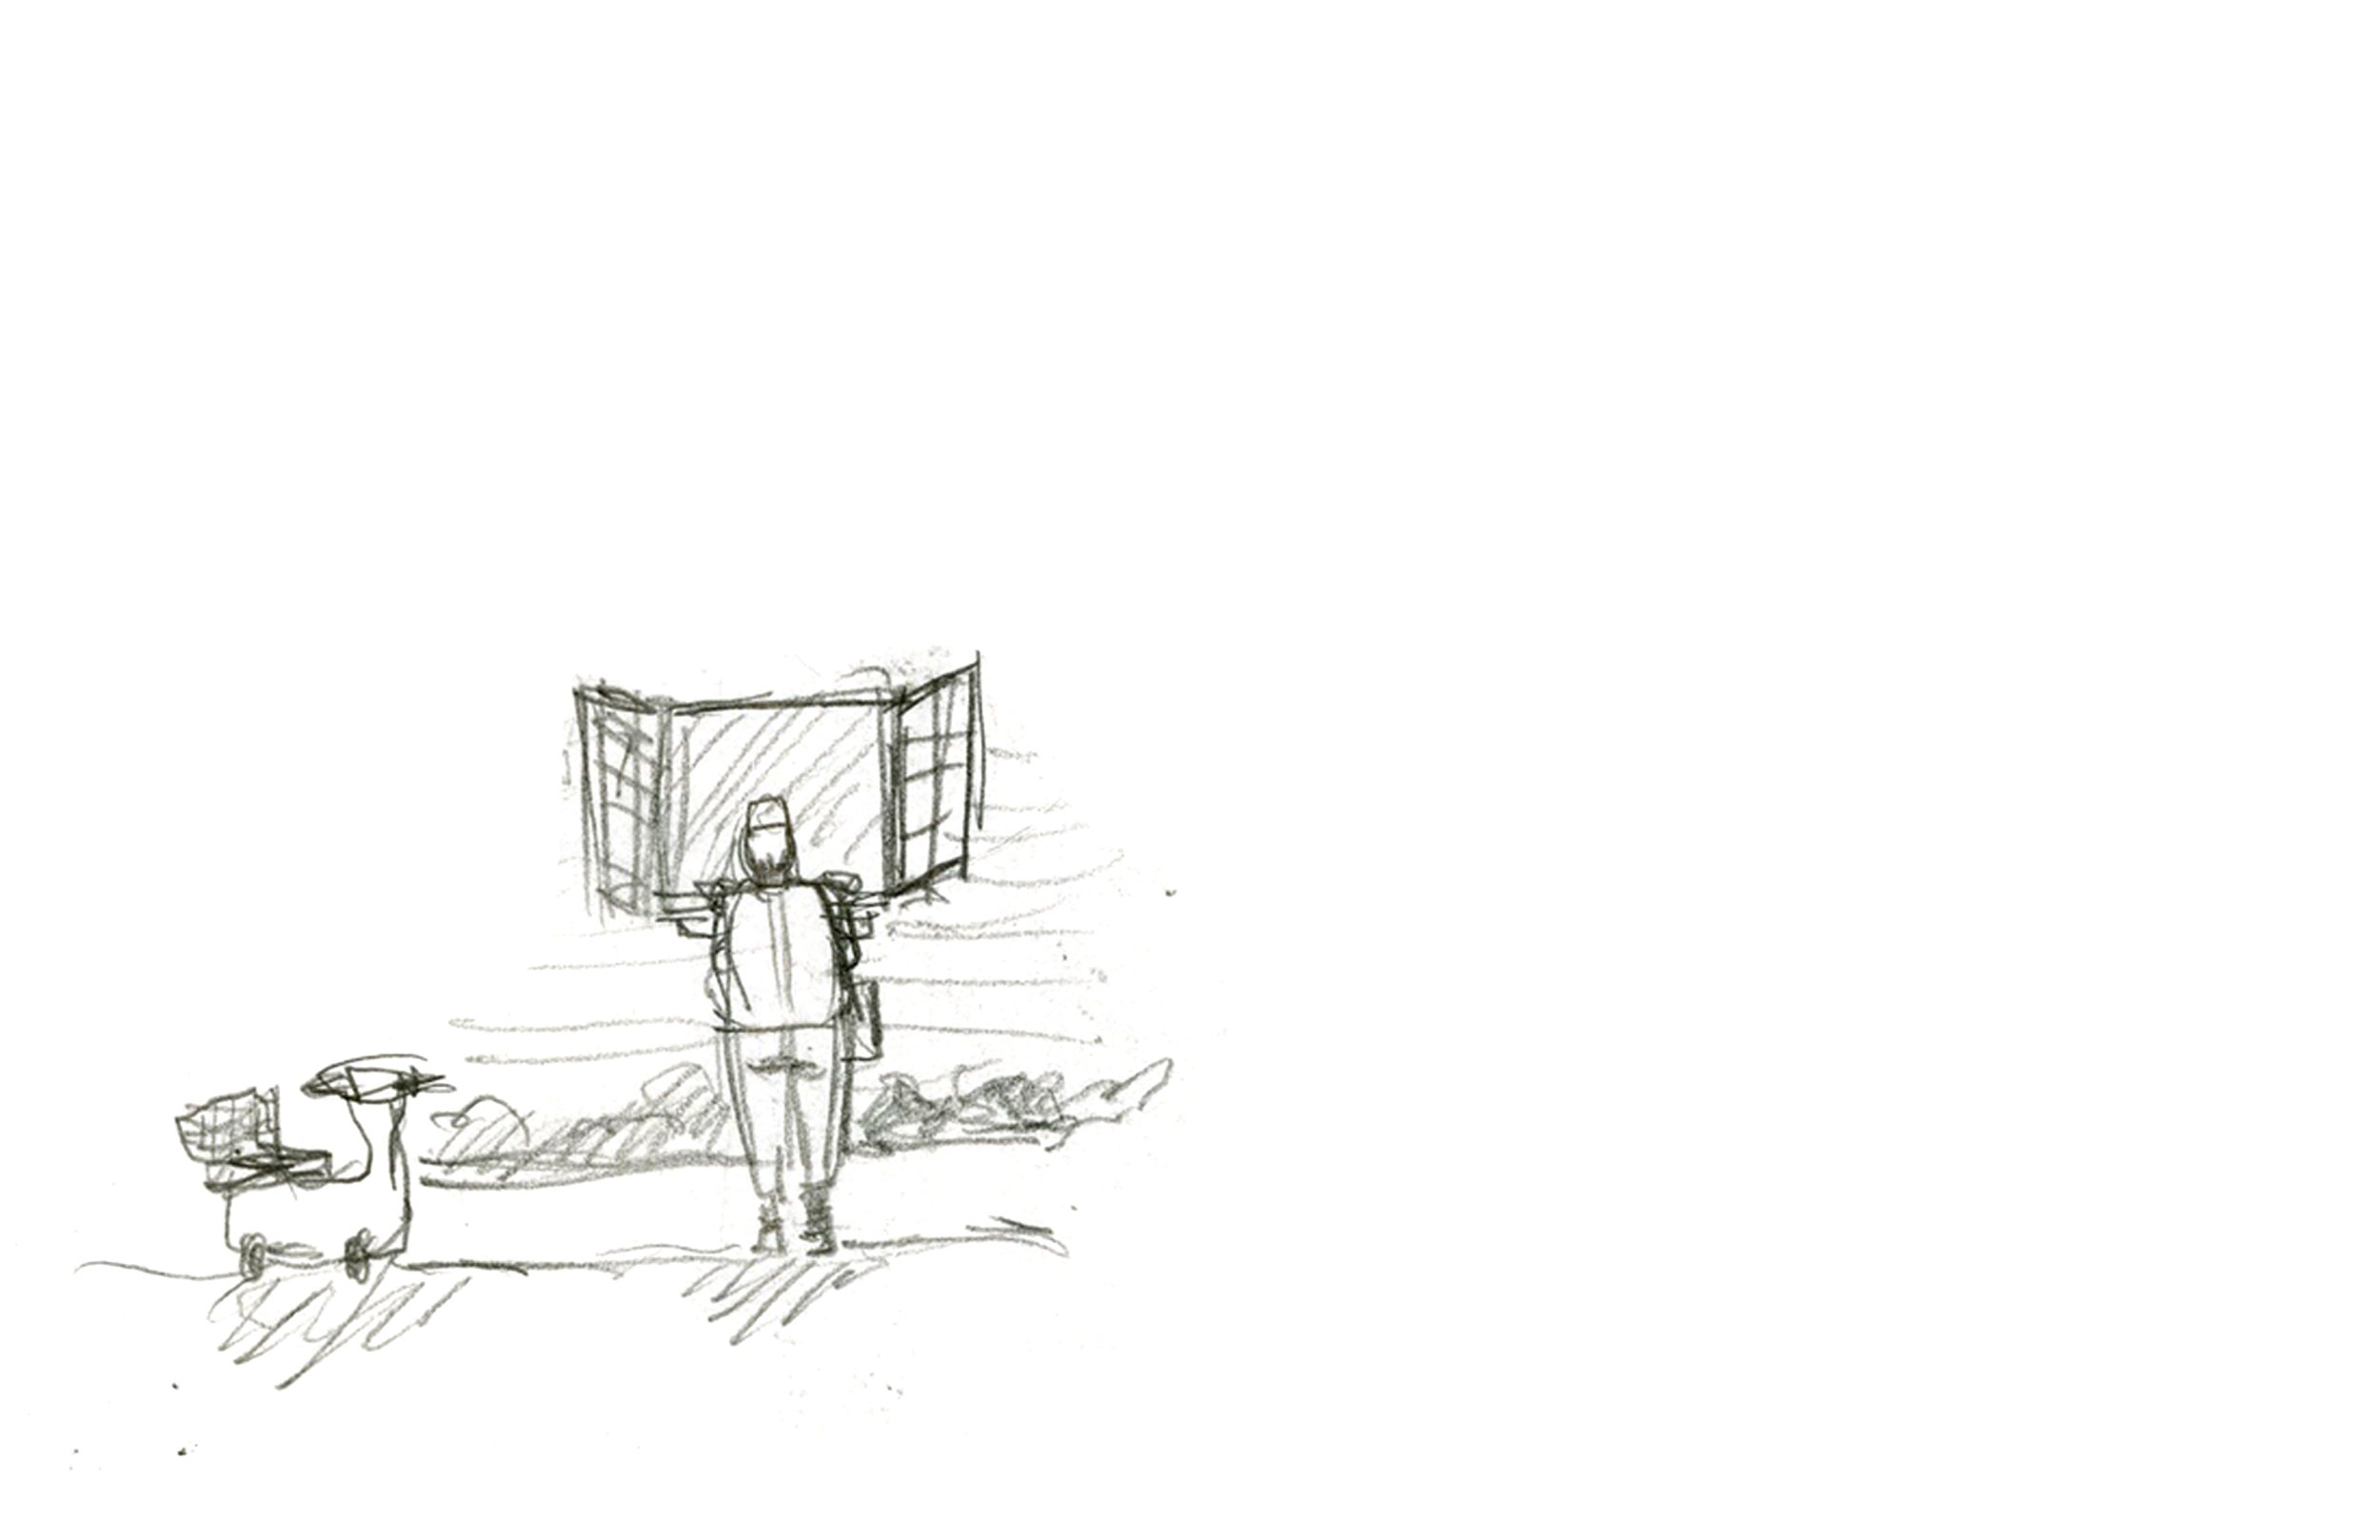 Page 004.jpg